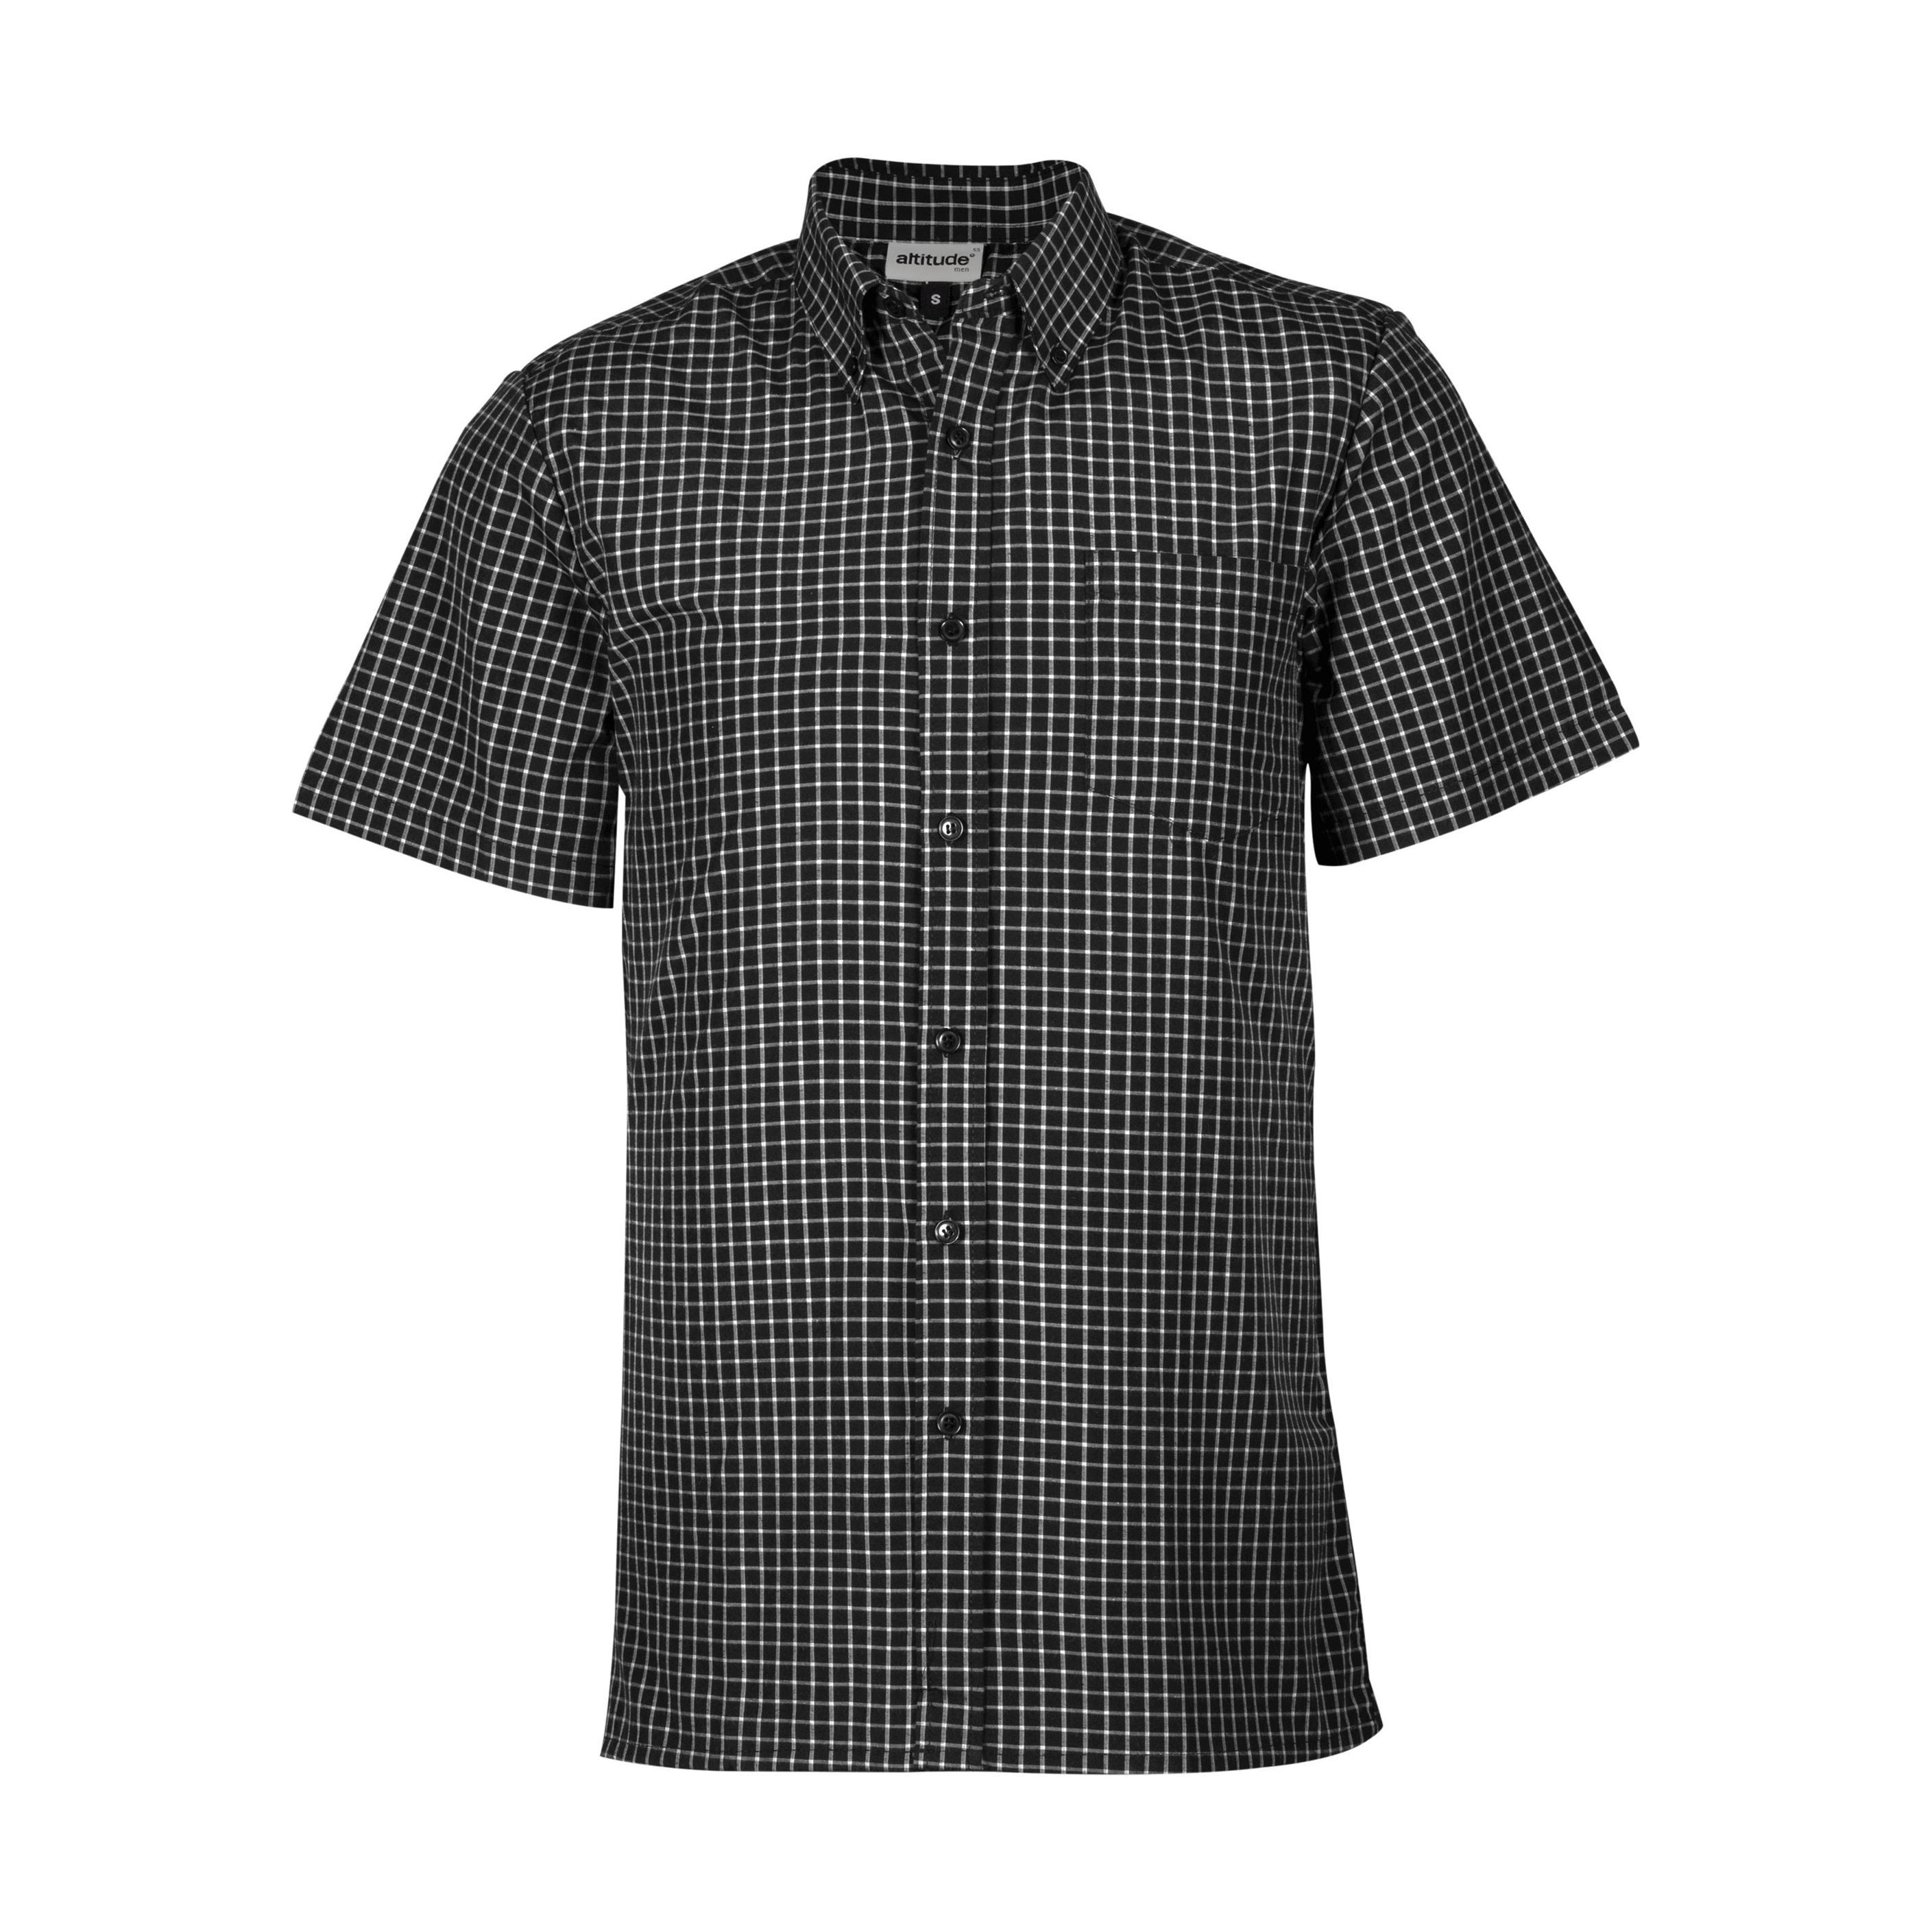 Mens Short Sleeve Prestige Shirt - Black Only